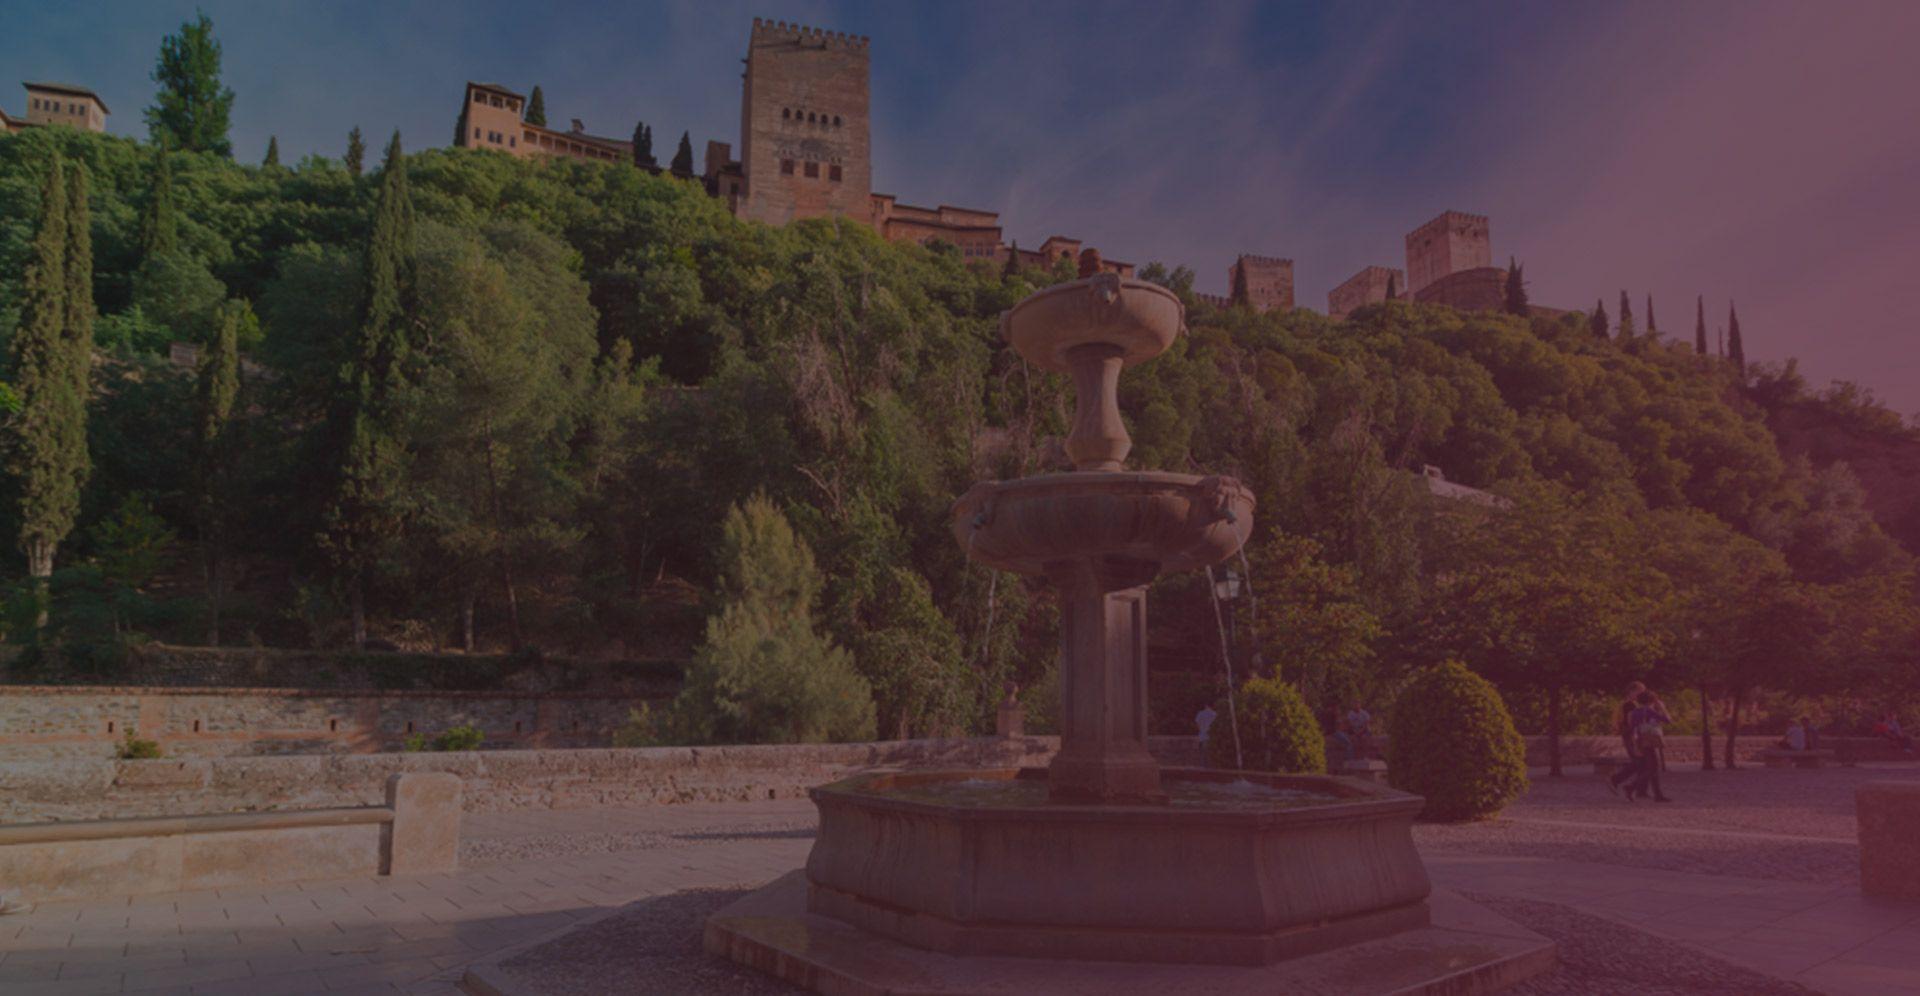 BIBO SUITES - La Alhambra